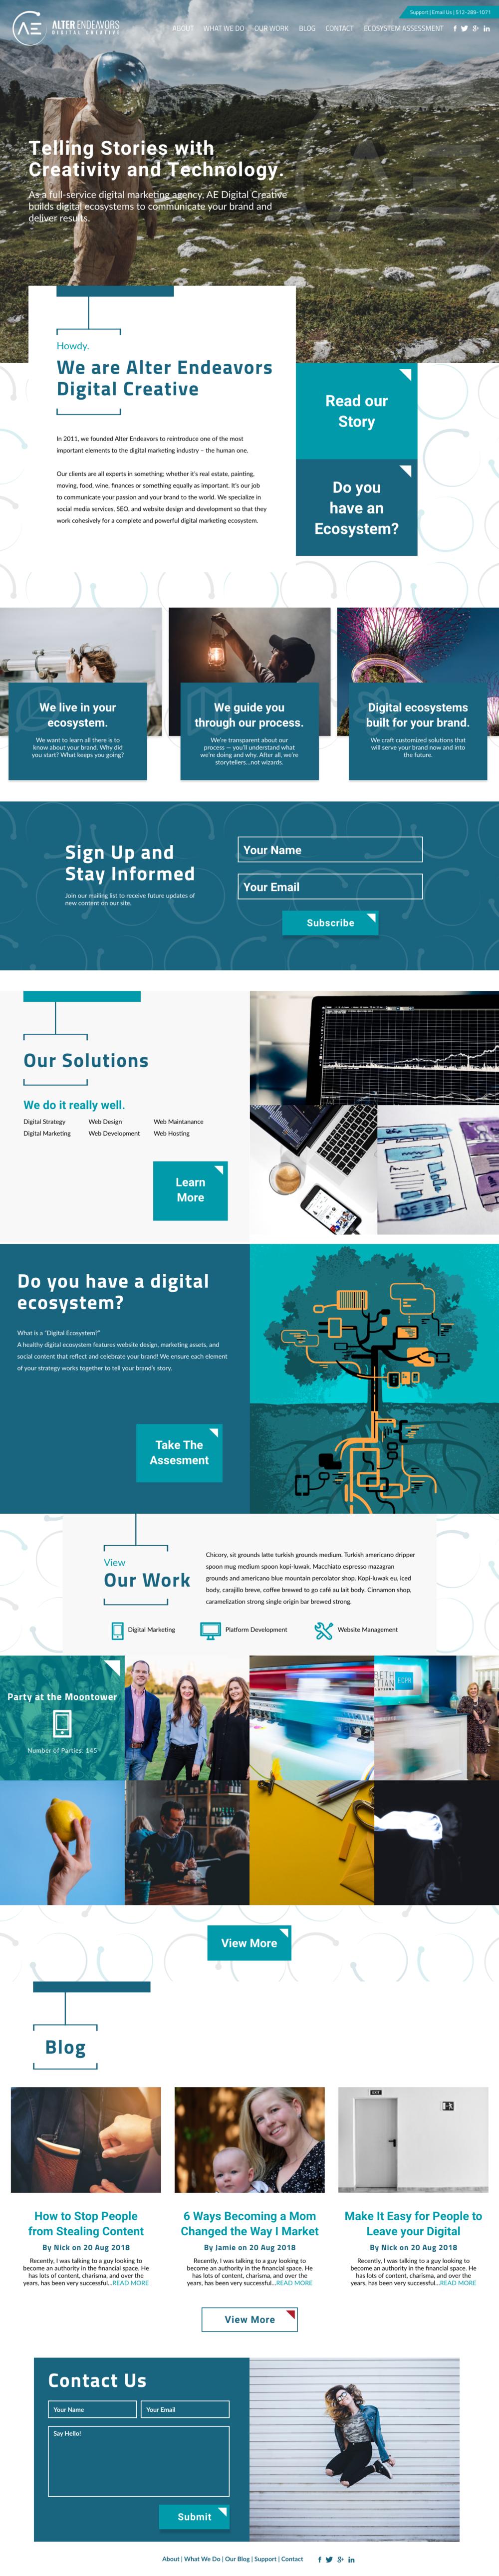 AE Homepage.png